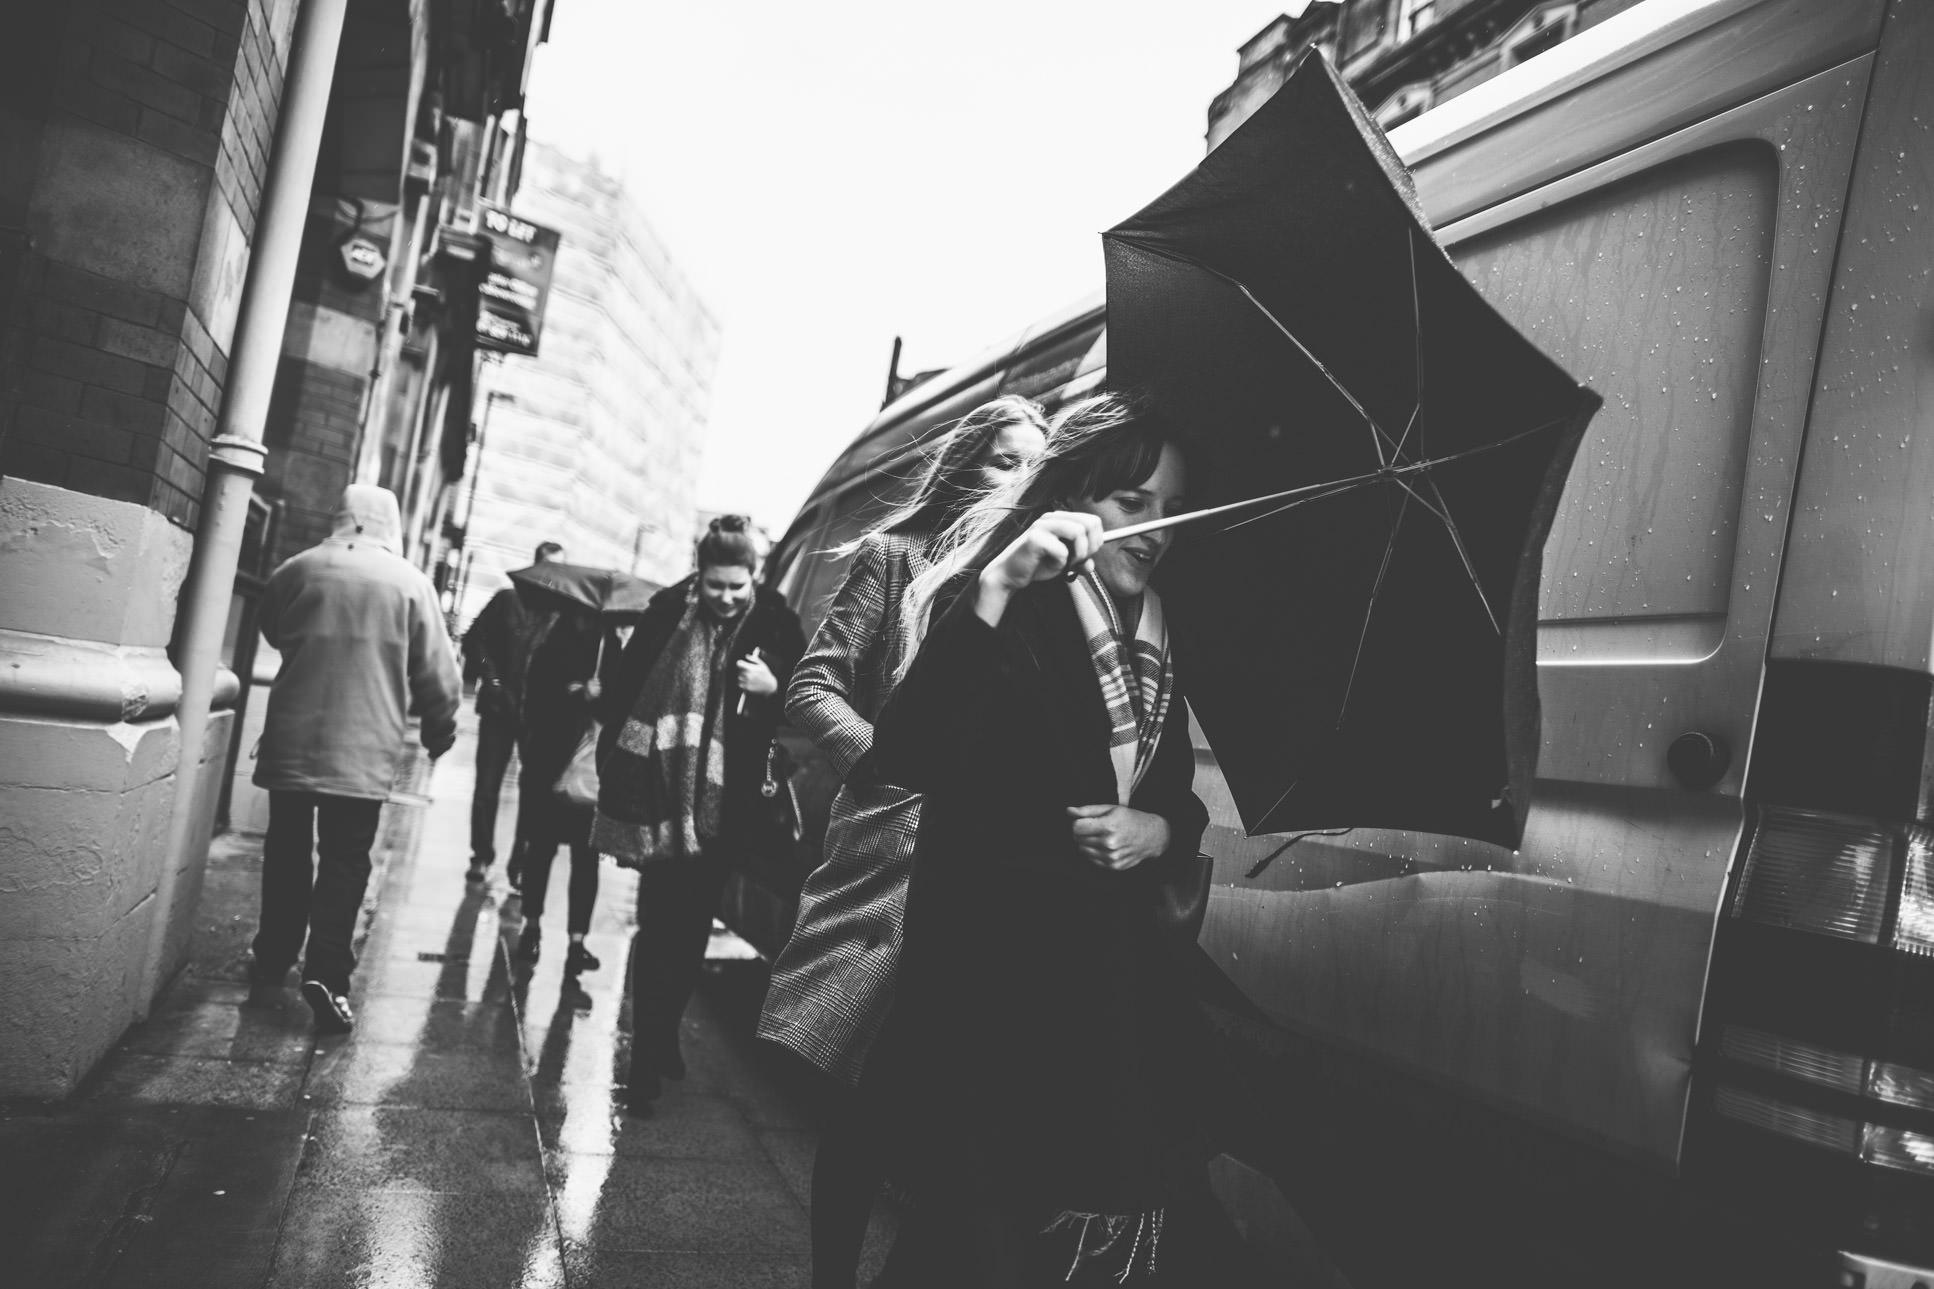 Street Photography12